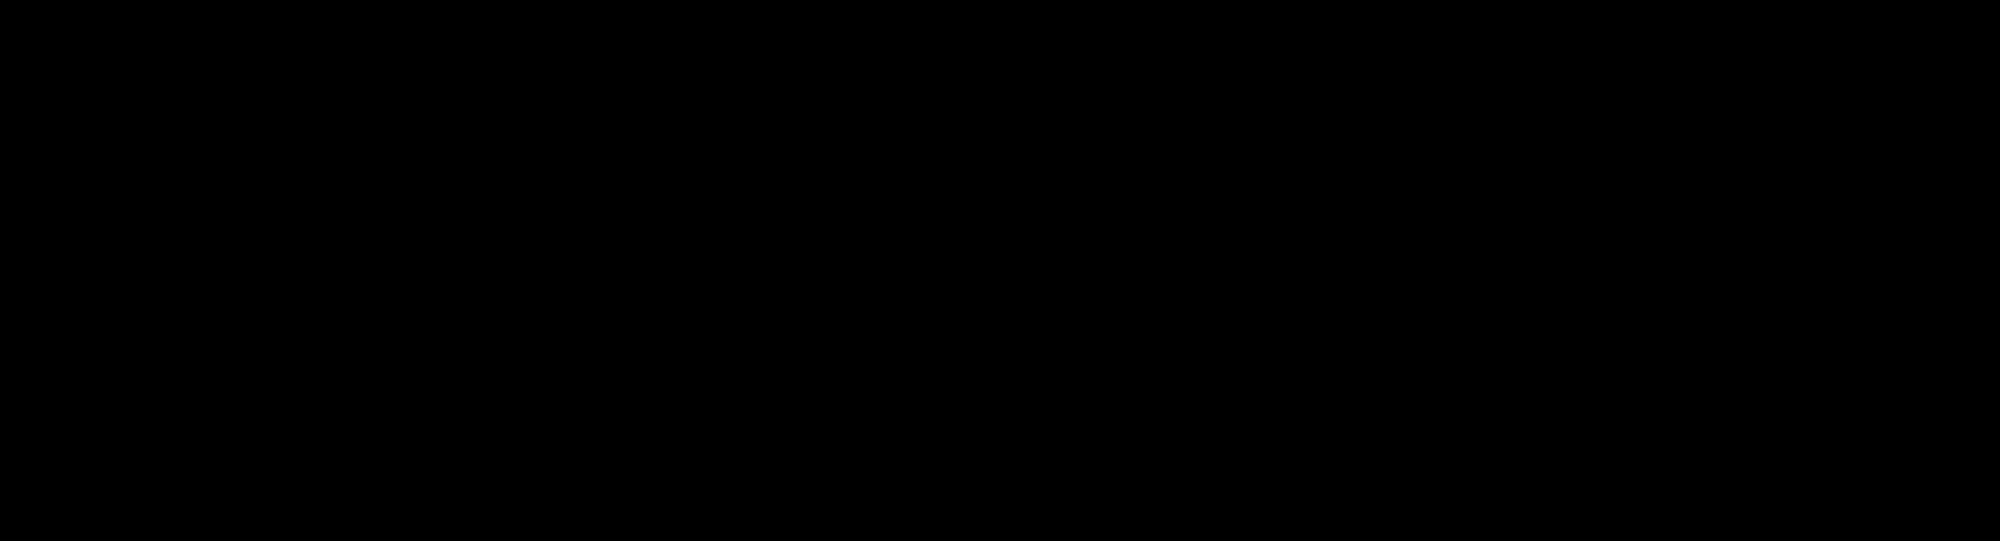 THE B NE HARVEST-logo-black.png